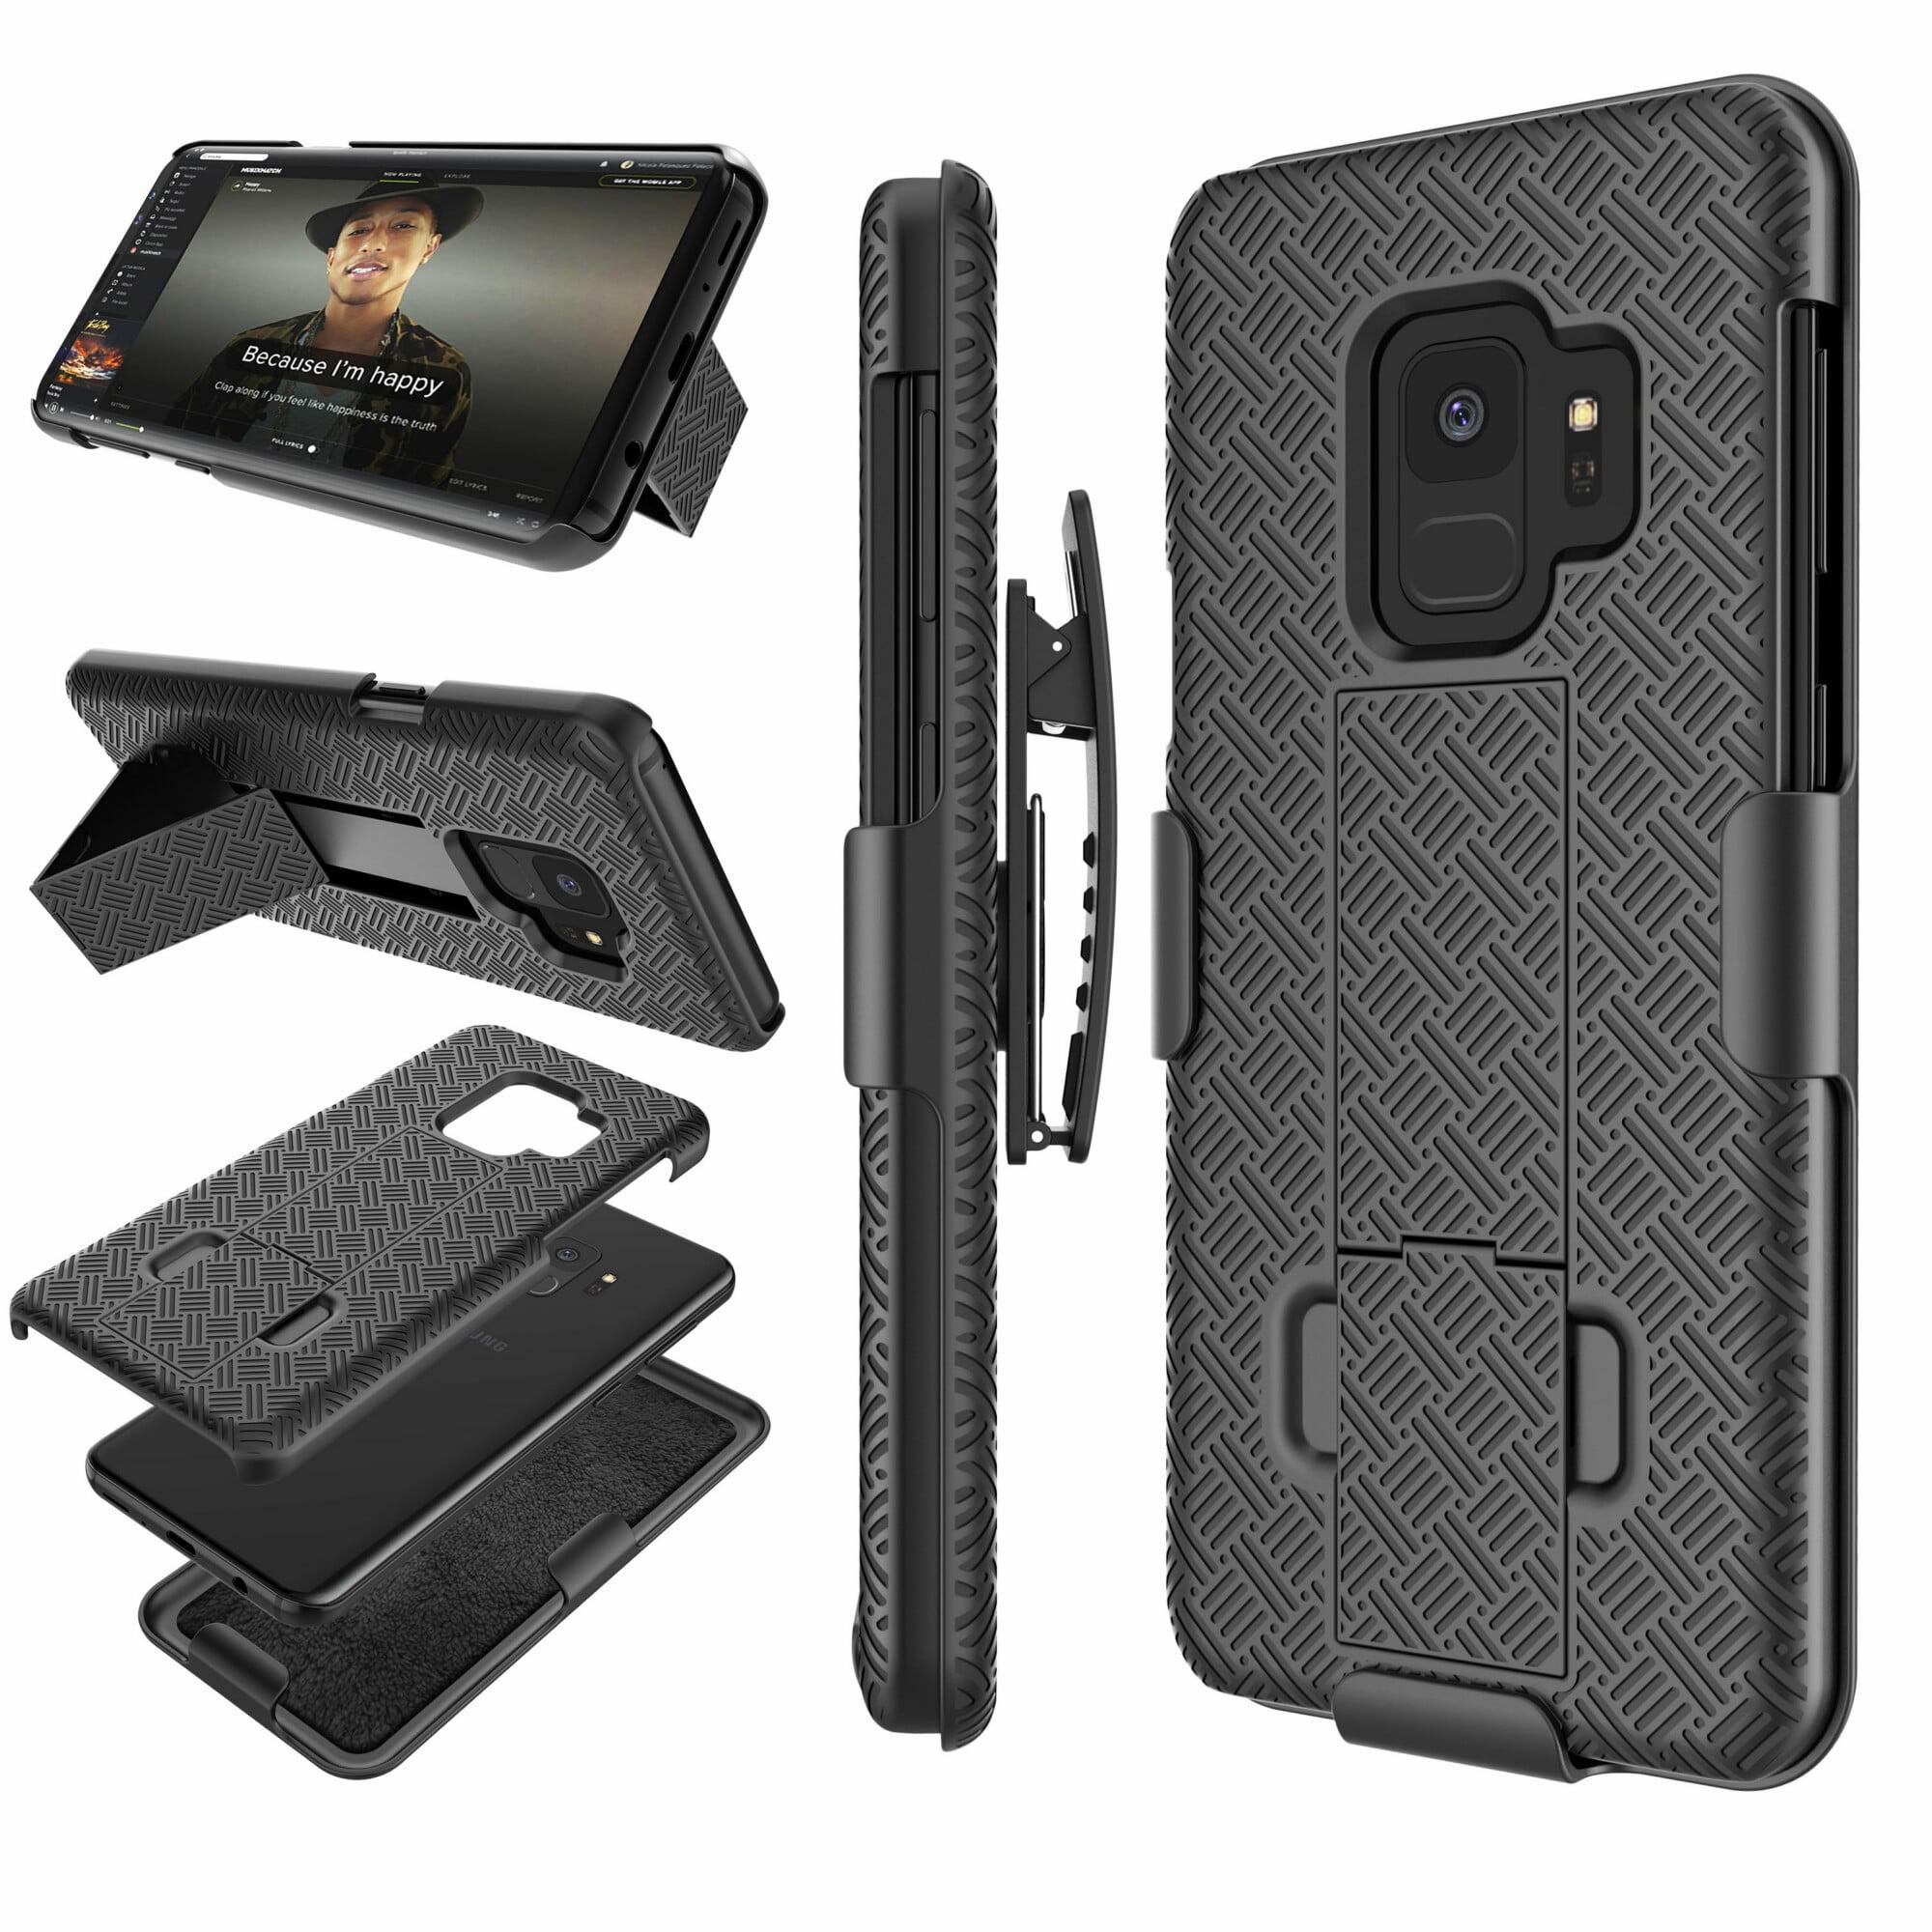 Galaxy S9 Case, Samsung S9 Hard Case, Njjex Hard Shell [Built-in Kickstand] Holster Locking Belt Swivel Clip Defender Secure Slim Case Cover For Samsung Galaxy S9 (2018) -Black